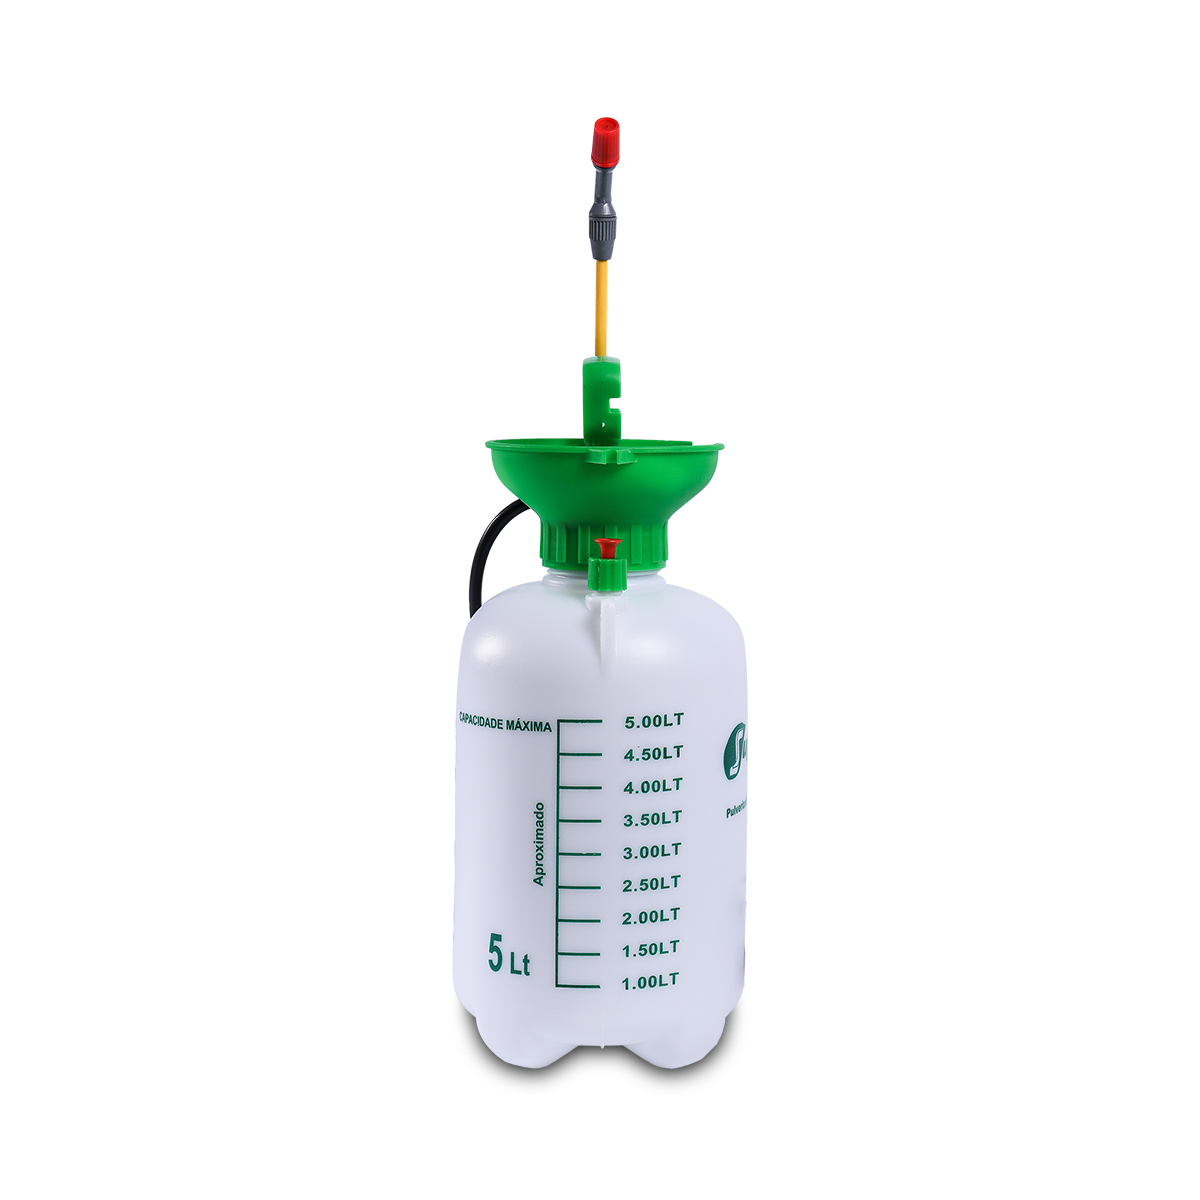 Kit 3 Unidades Pulverizador Manual SAPPA5L de Pressão Acumulada 5 Litros